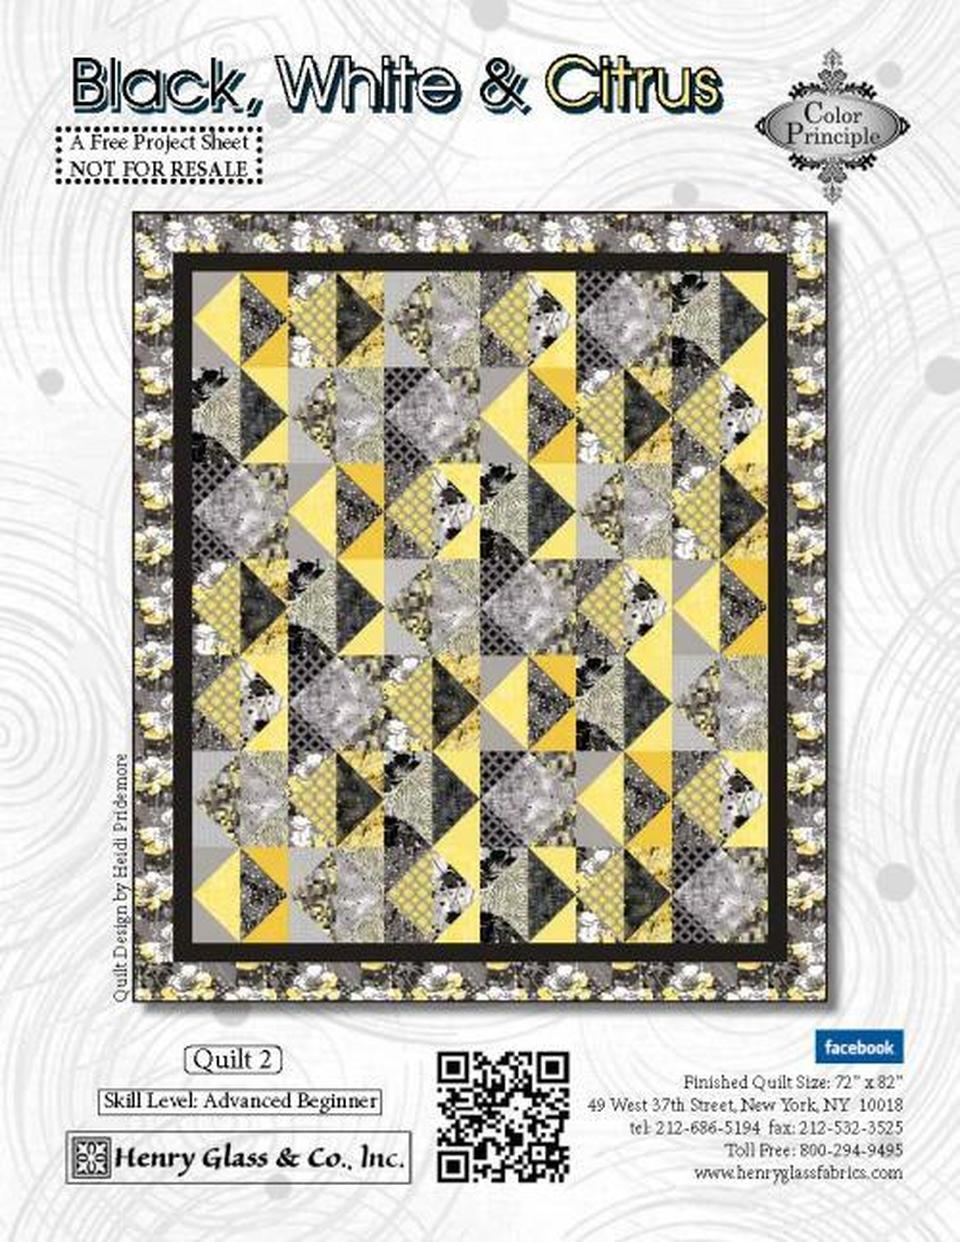 Black White & Citrus Quilt Pattern